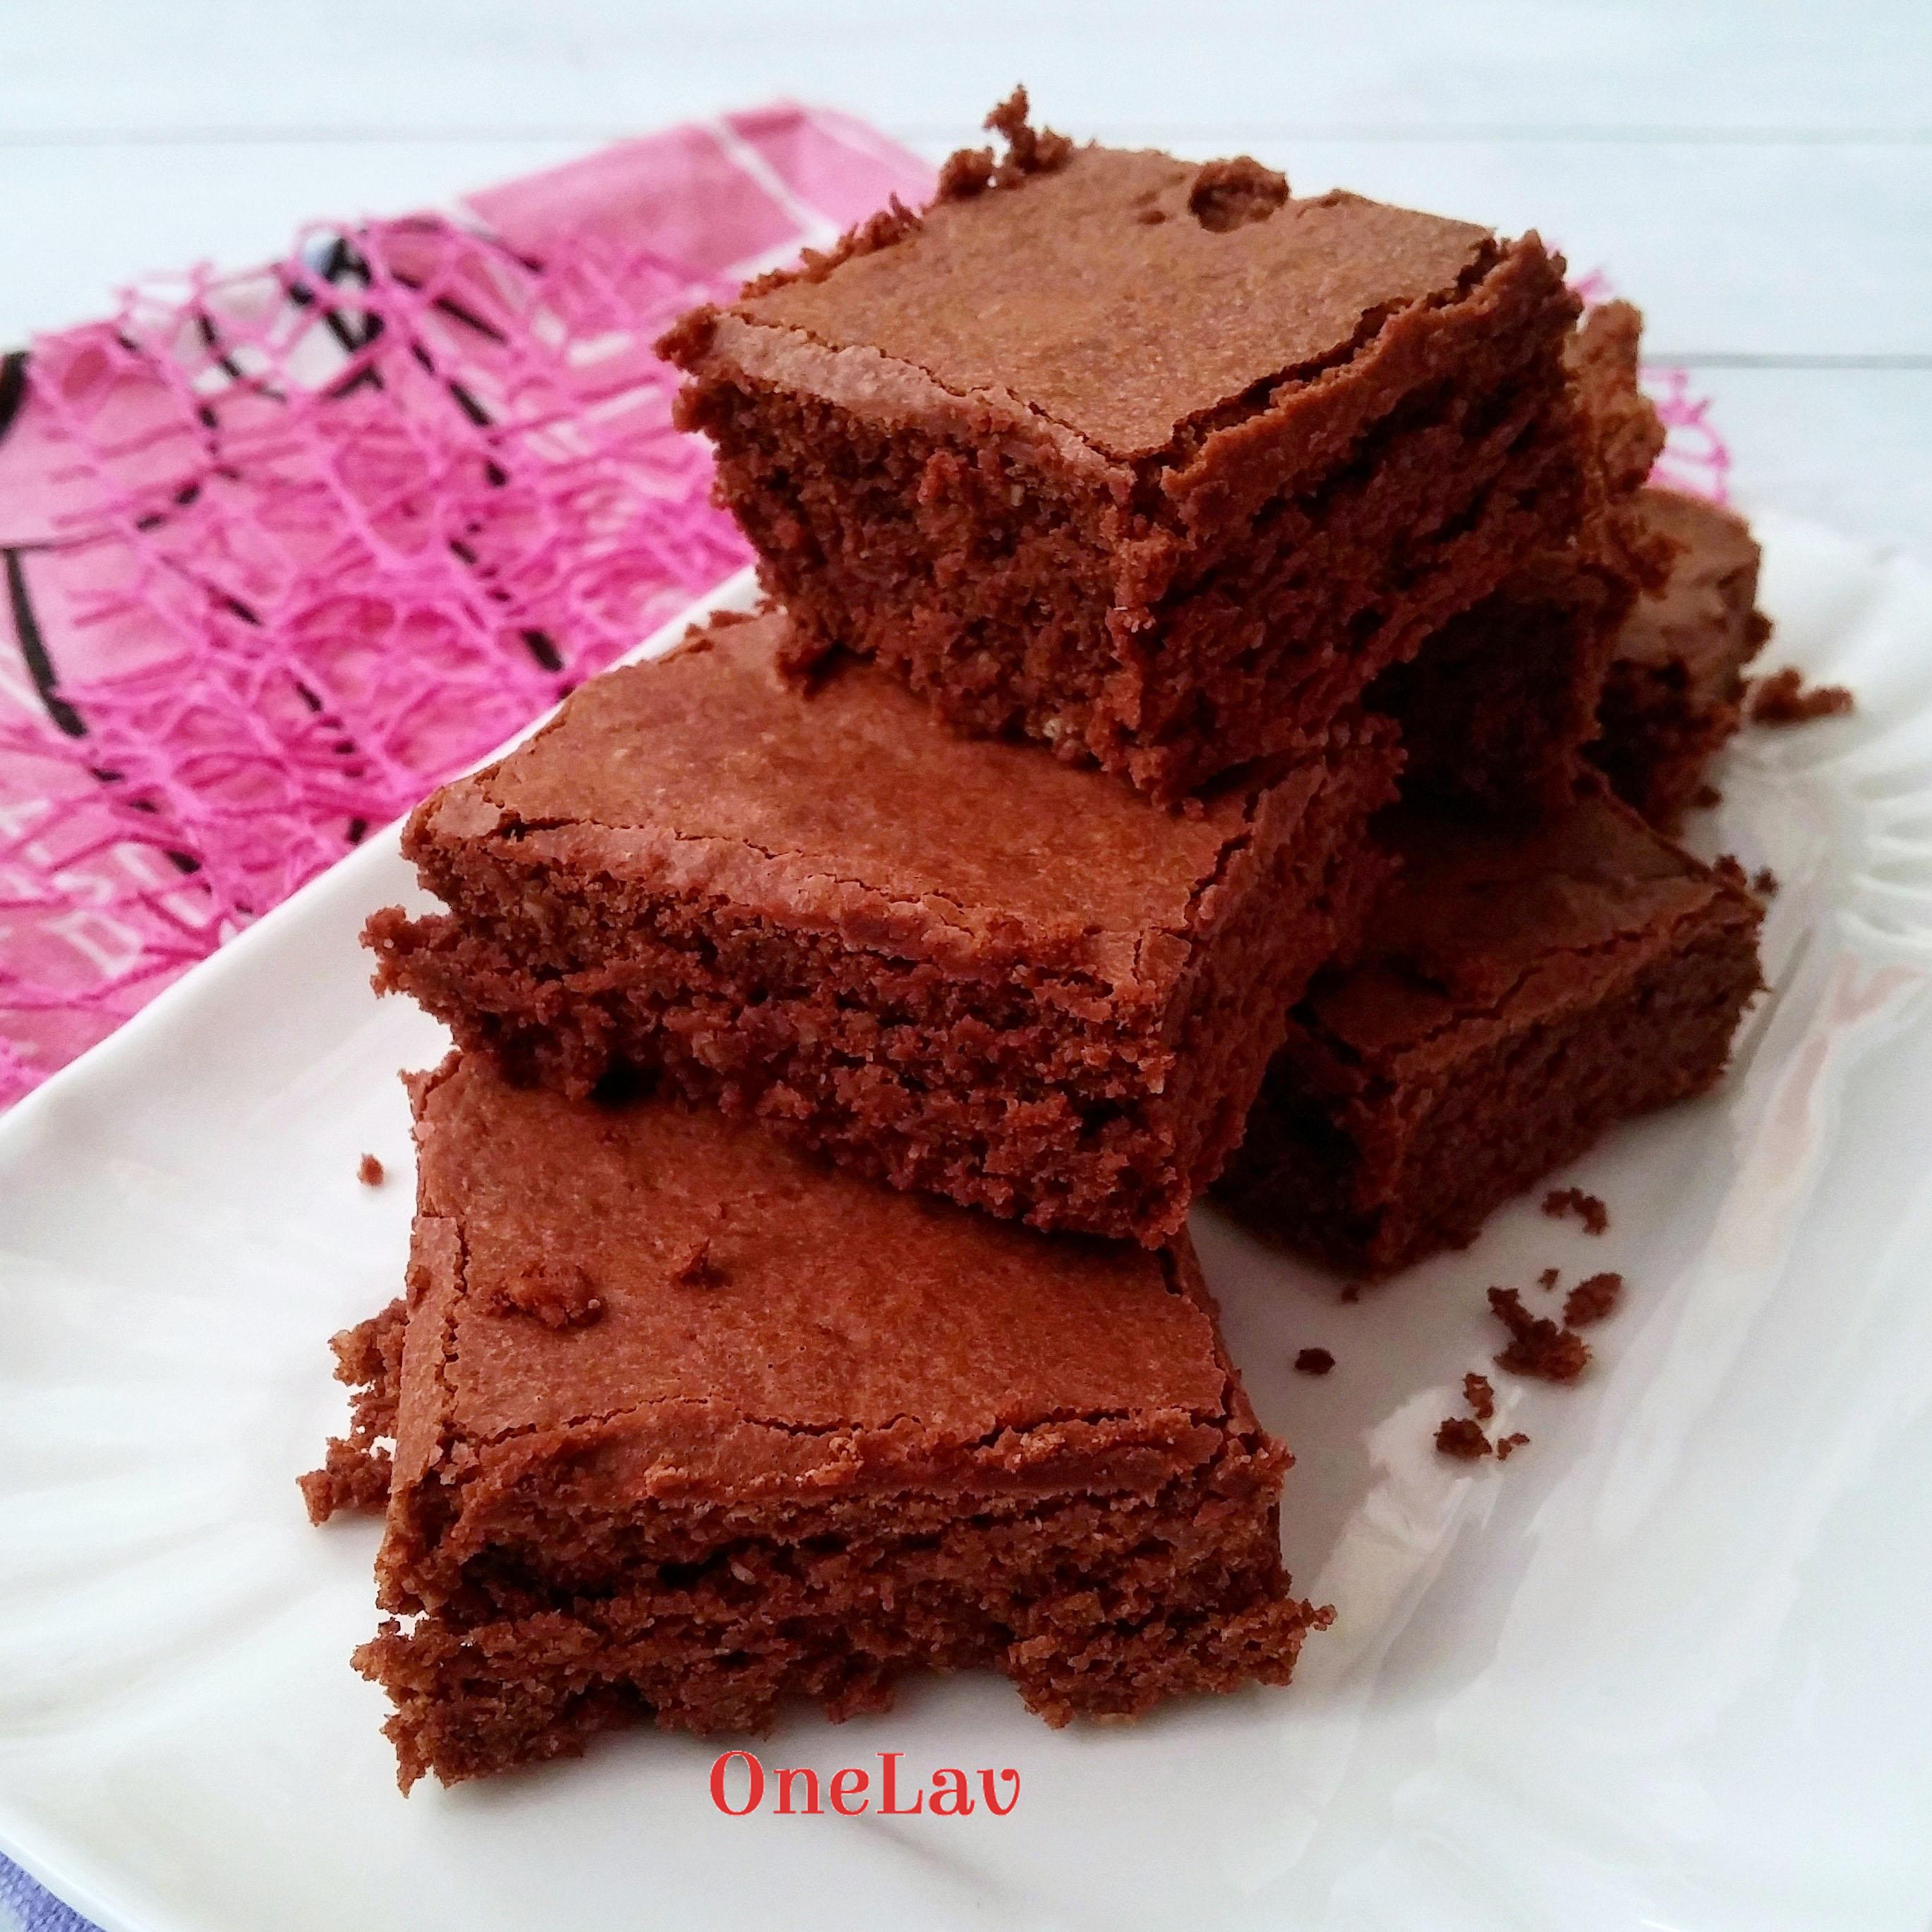 La sofficissima Red Velvet Cake di Martha Stewart | OneLav